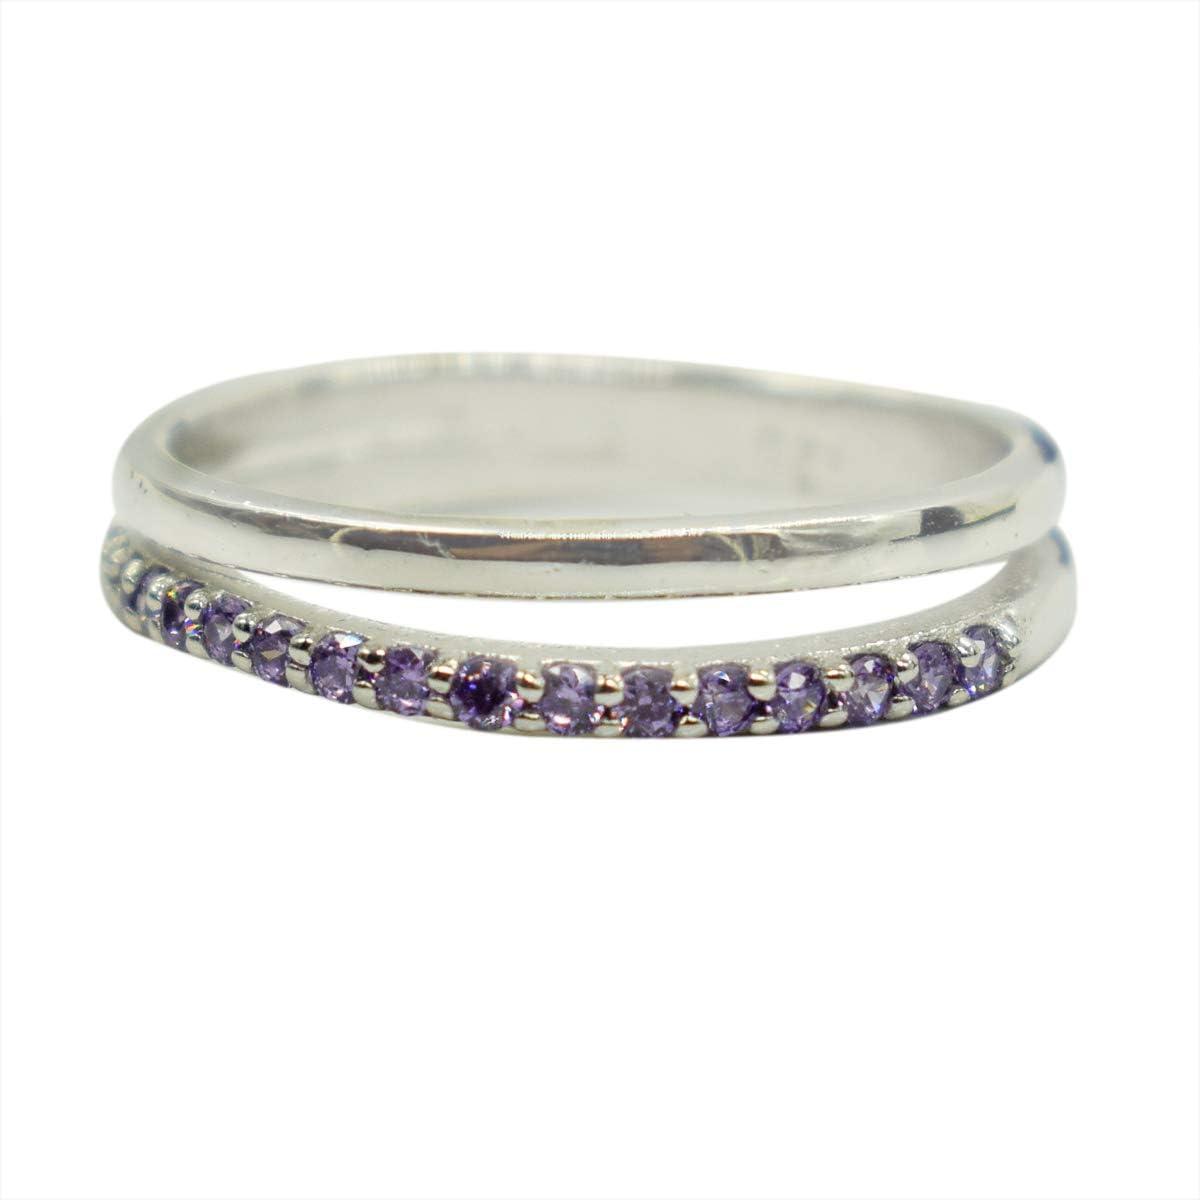 Ravishing Impressions Purple 55% OFF Amethyst February Birthstone Finally popular brand Design